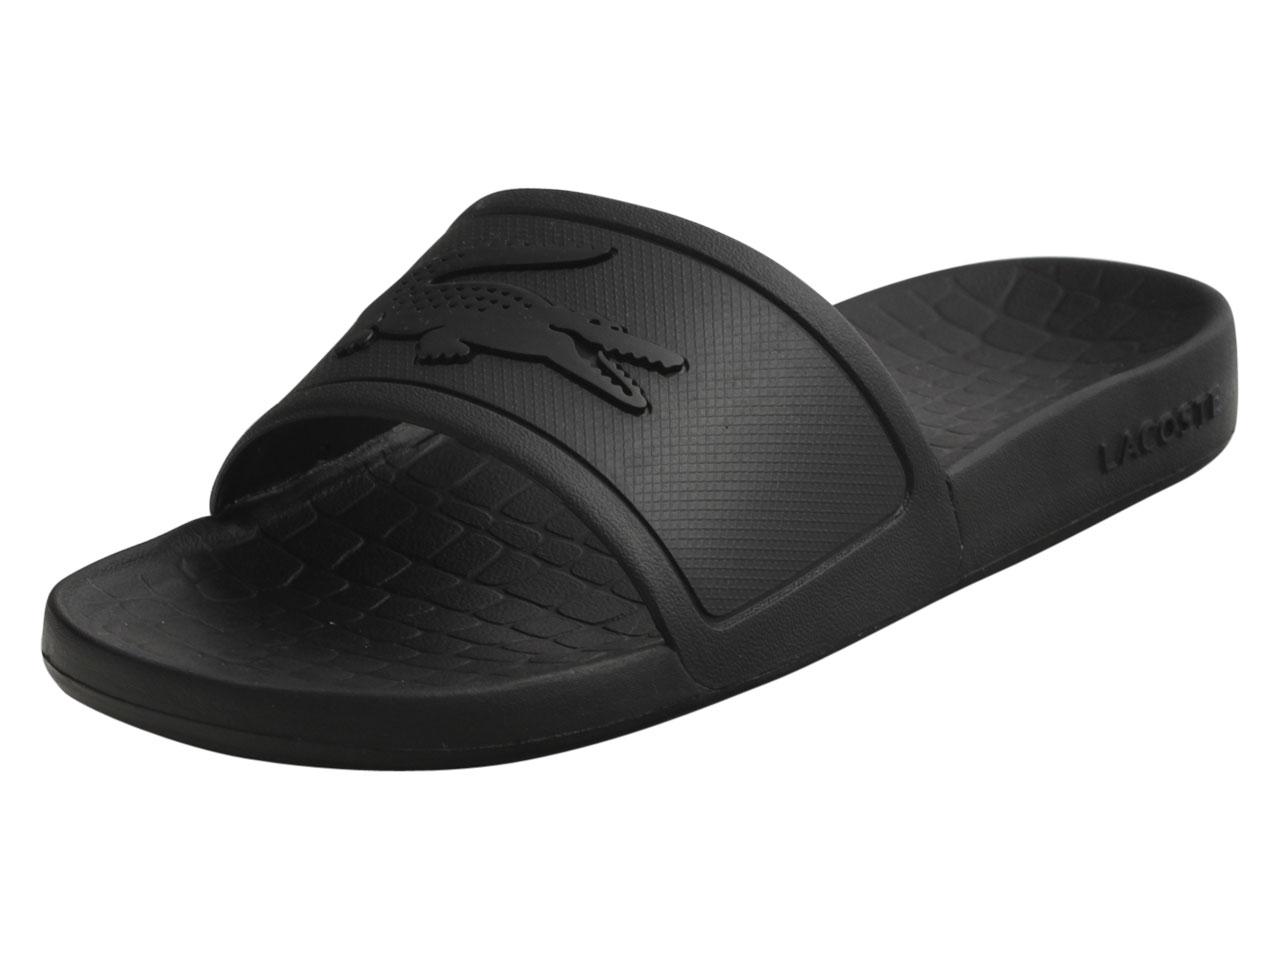 3bf75613472e Lacoste Men s Frasier Black Textured Black Slides Sandals Shoes